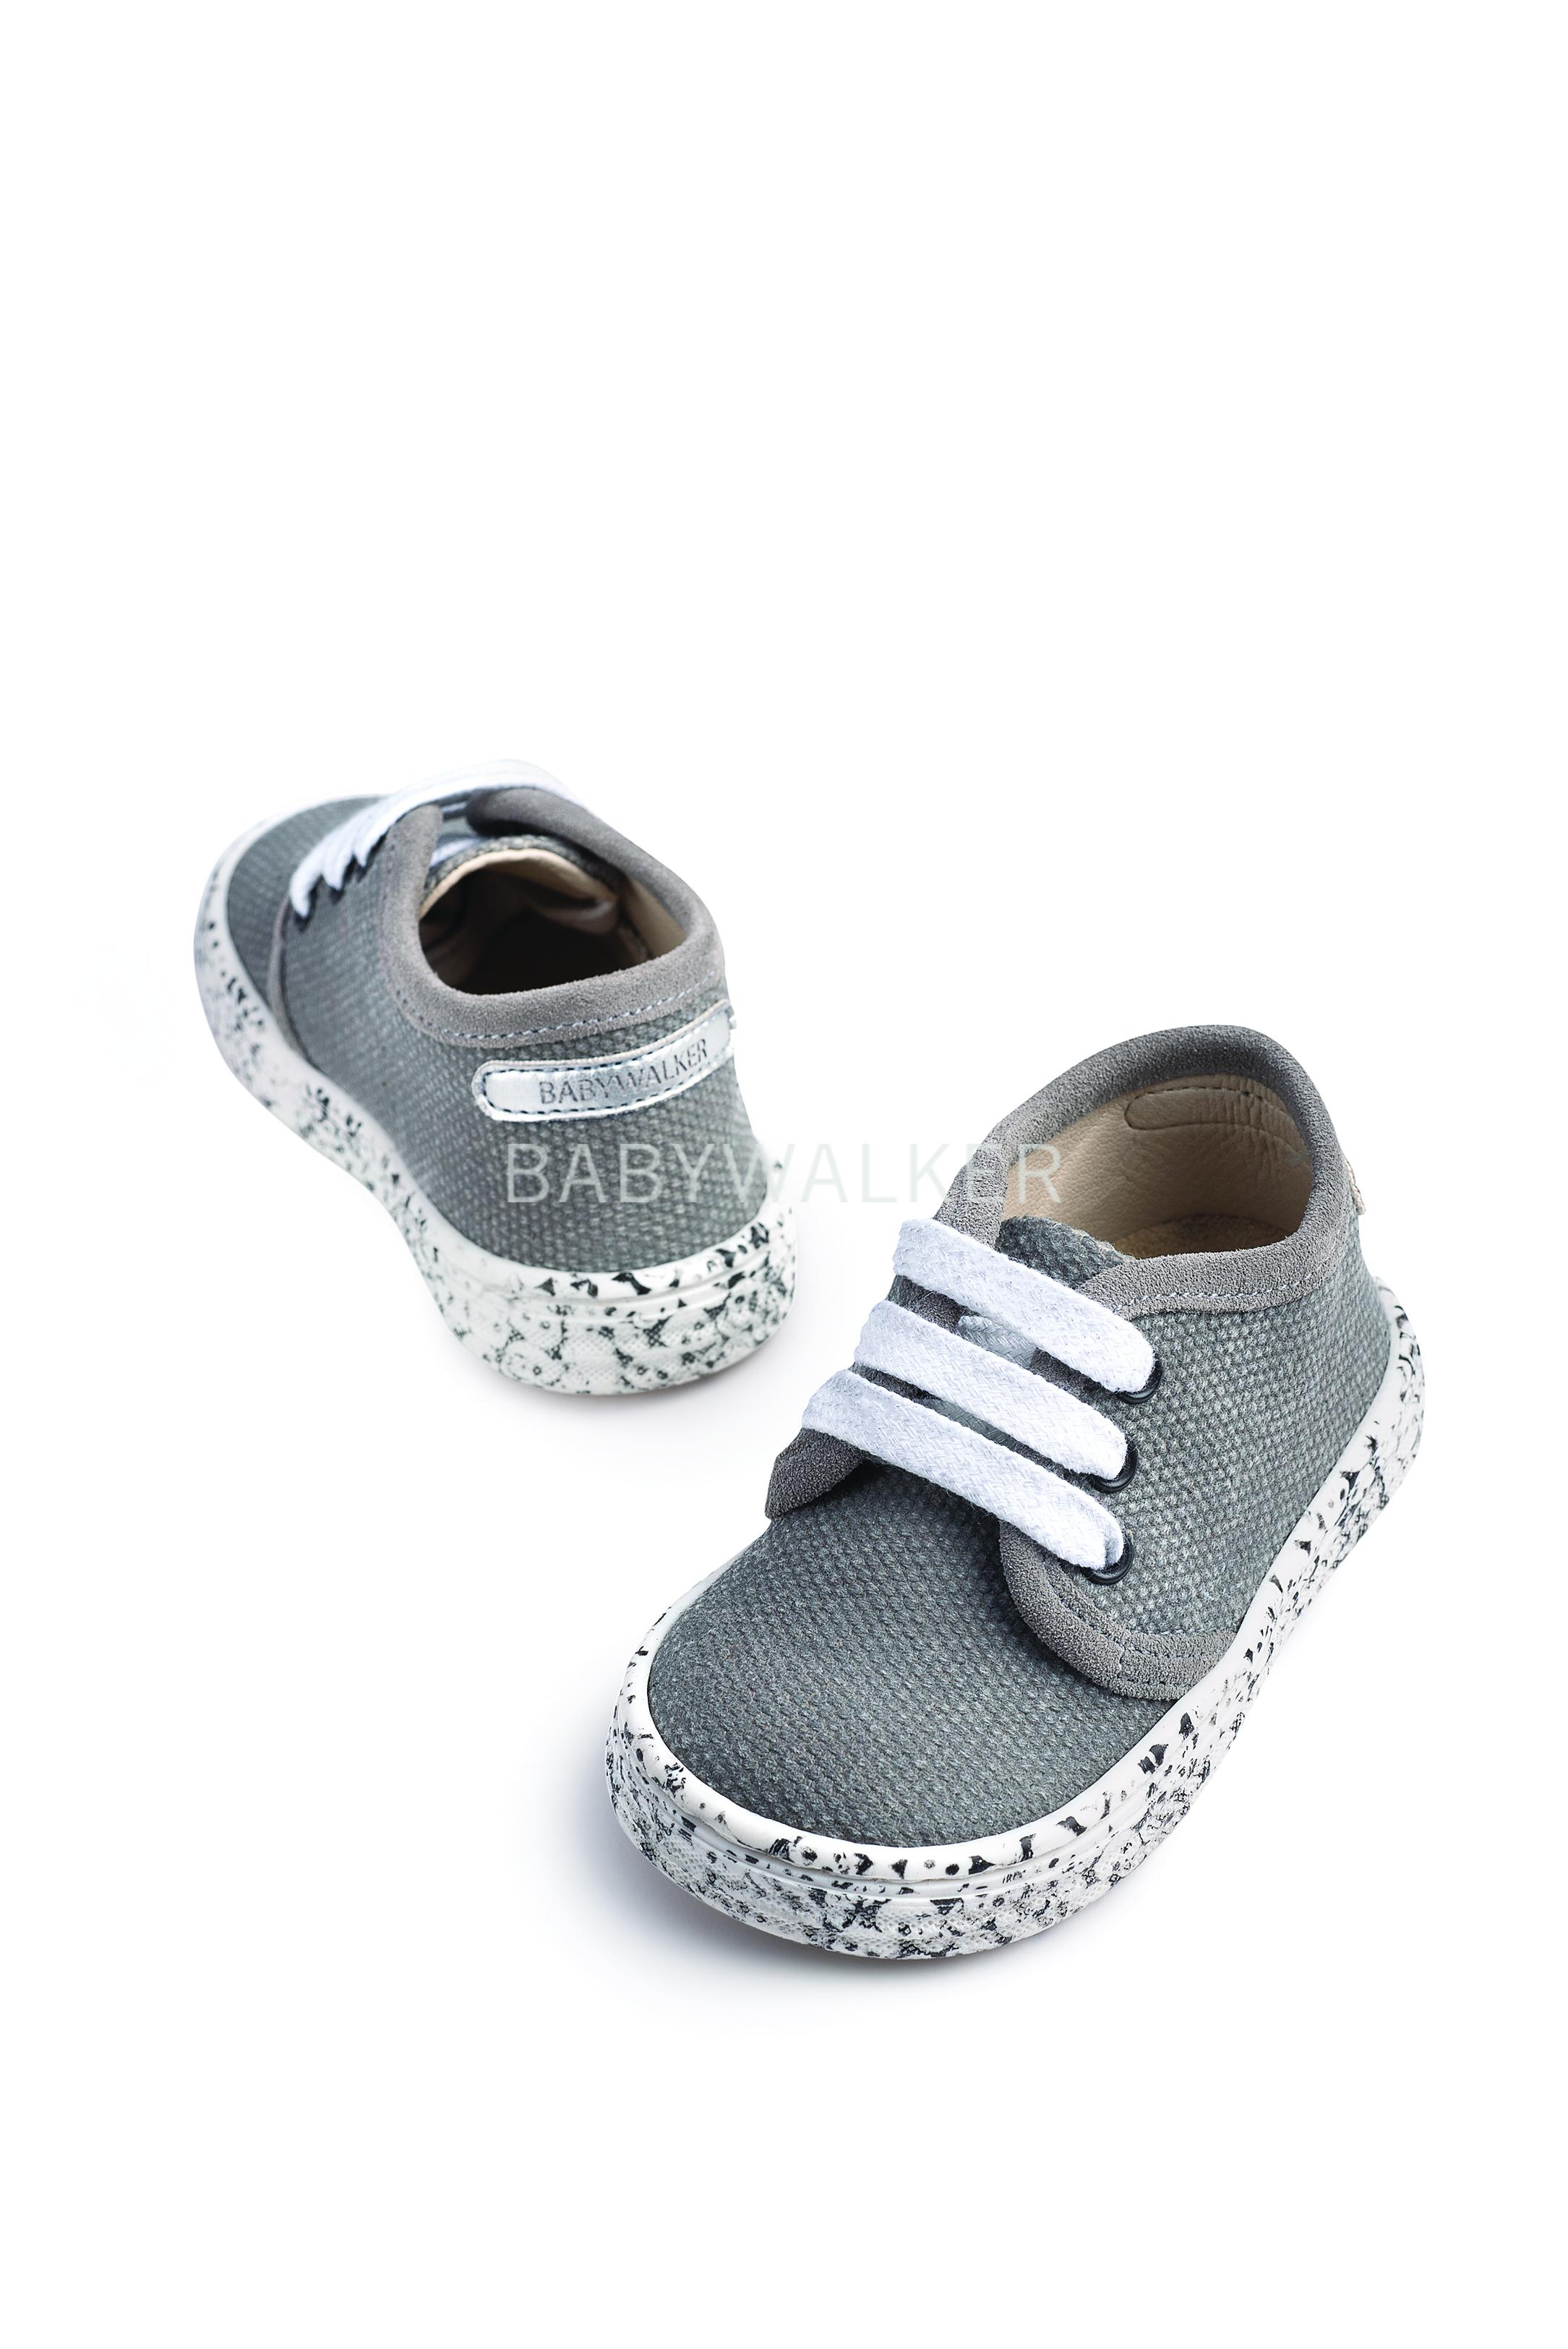 6810ce73325 Υφασμάτινα δετά sneaker